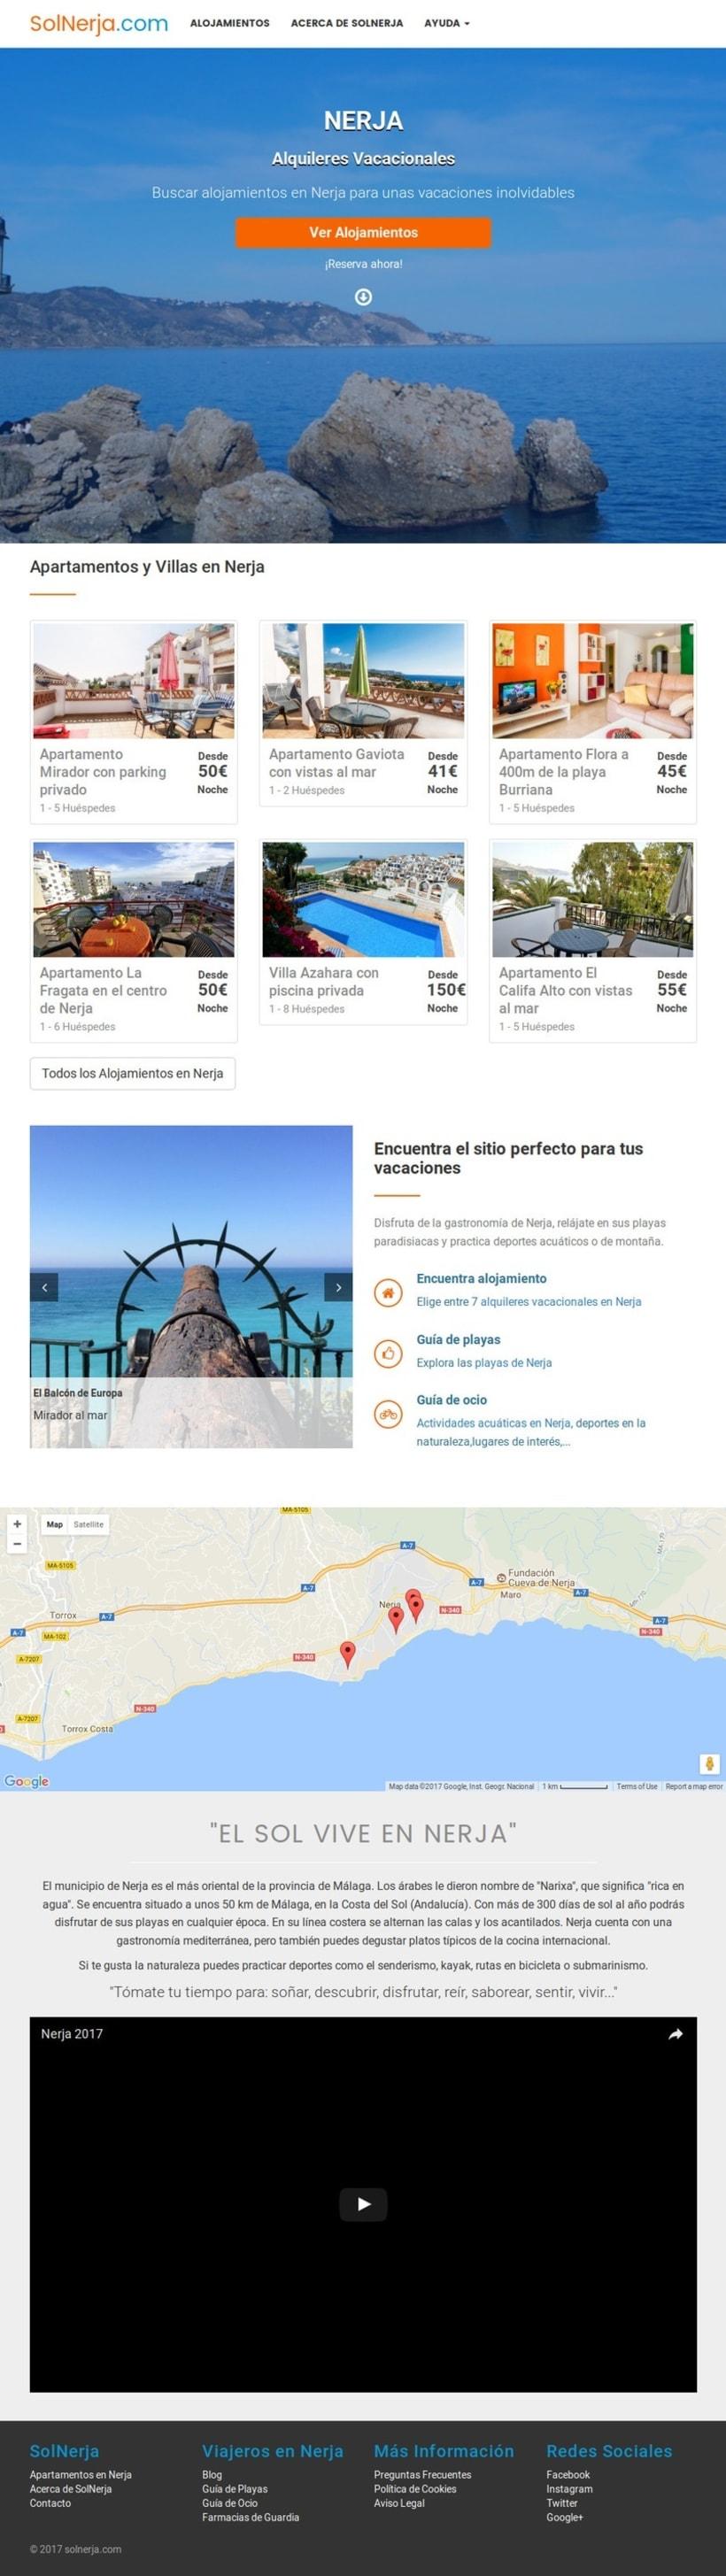 Alquiler de vacaciones en Nerja - Solnerja.com -1